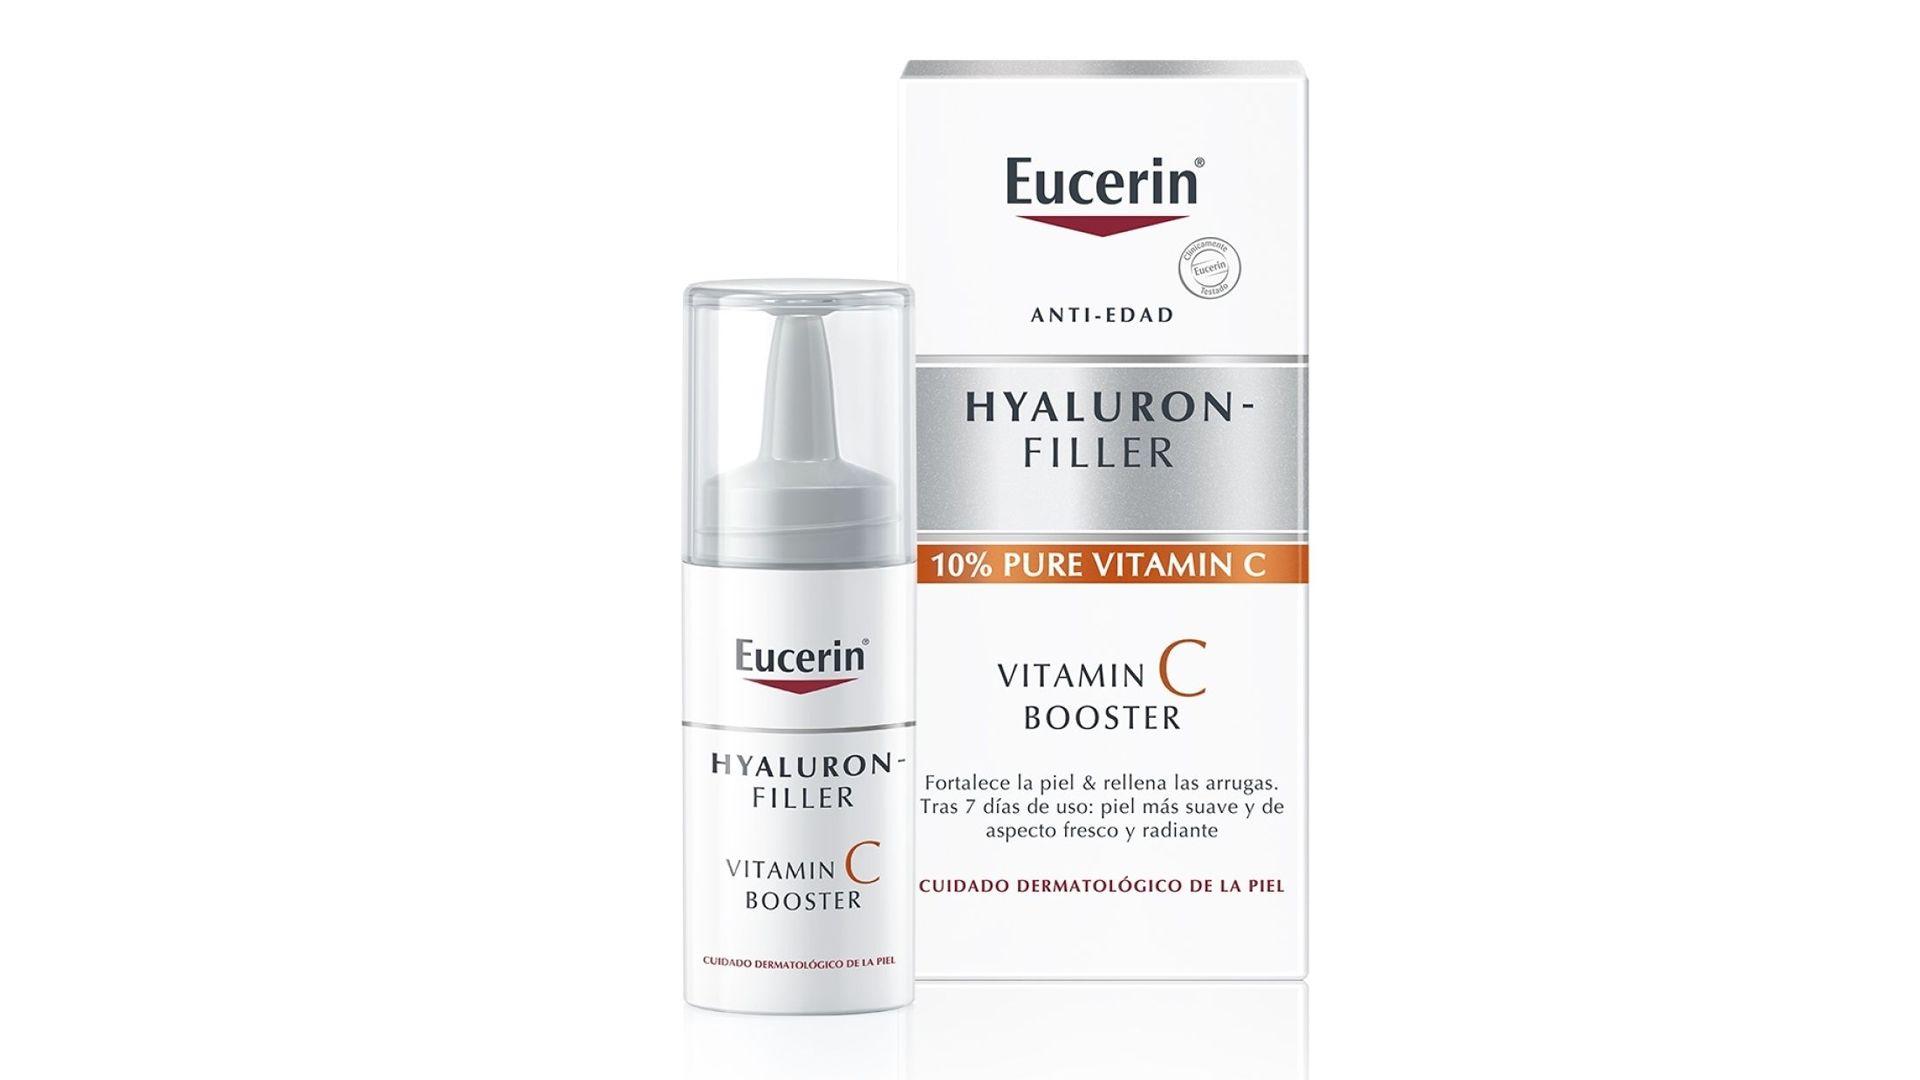 Eucerin - Hyaluron-Filler Booster Vitamin C Szérum